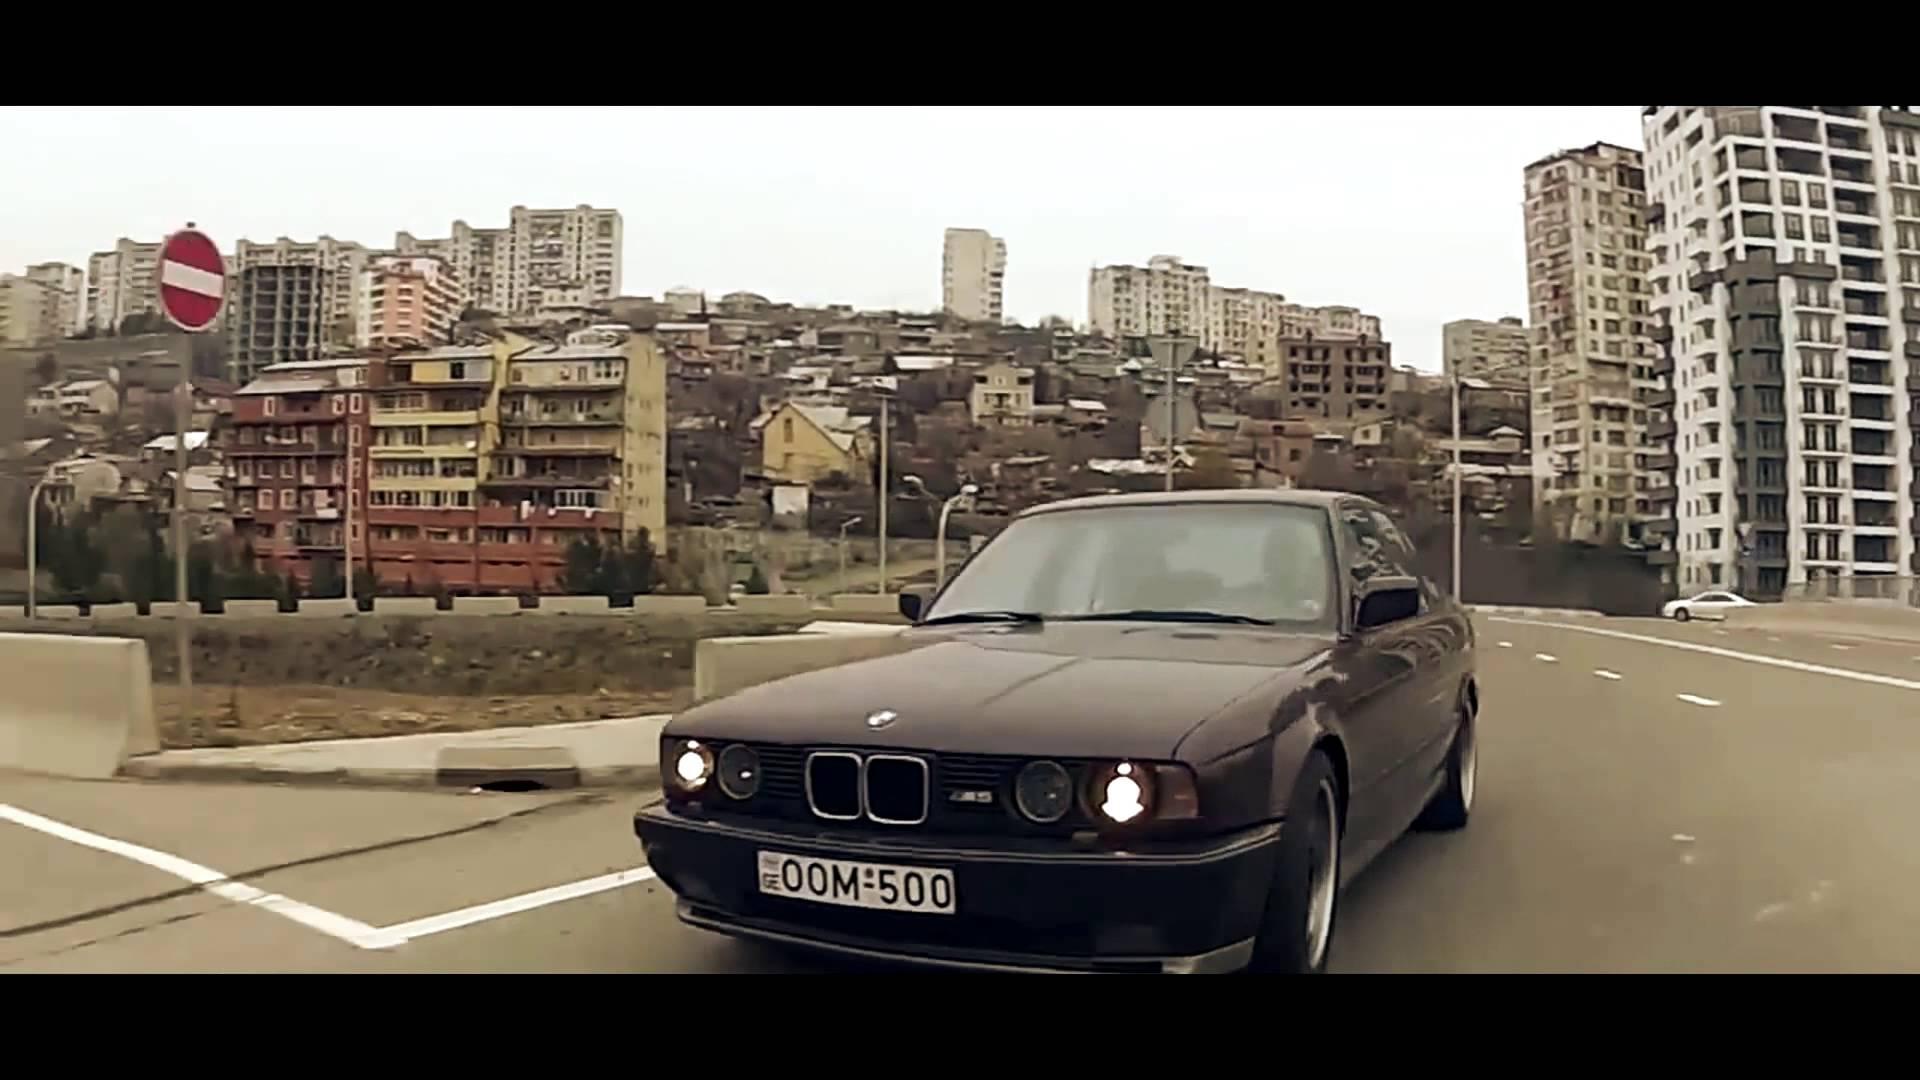 Giorgi Tevzadze Le Roi Defunt Du Georgian Drift Et Sa Bmw M5 E34 Page 1 M5 E34 Forumbmw Net